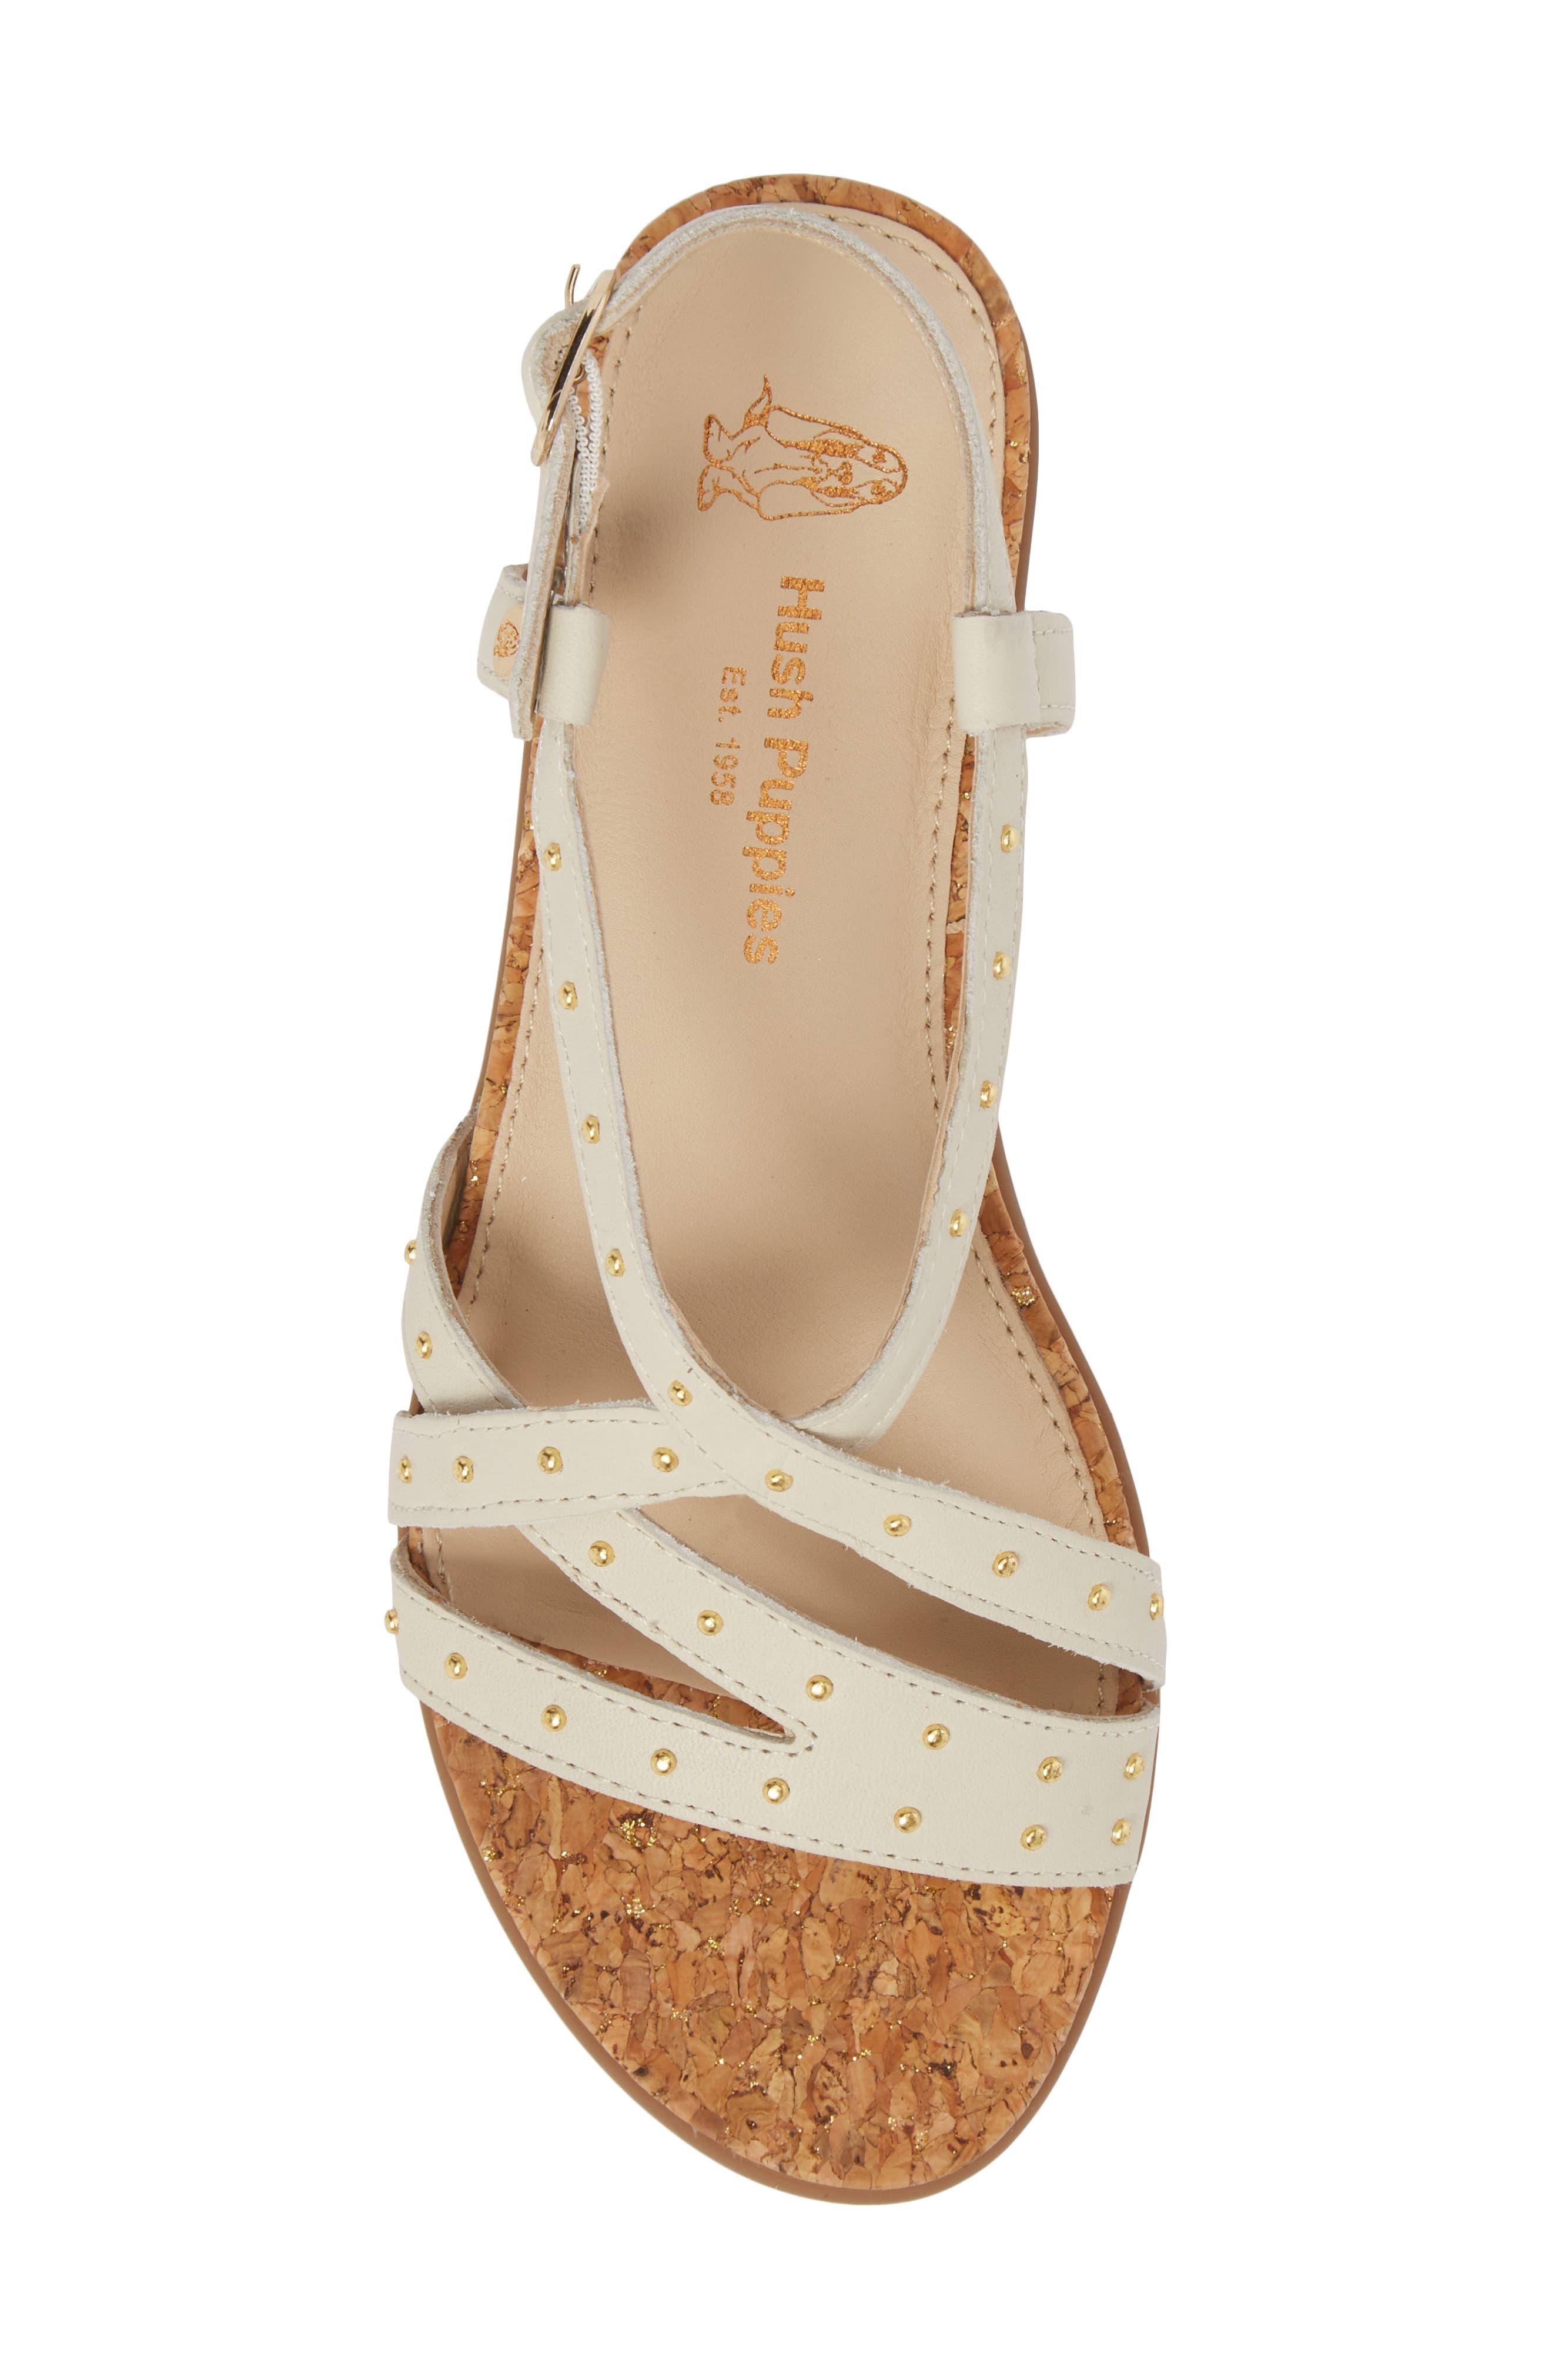 Dalmatian Studded Sandal,                             Alternate thumbnail 5, color,                             Ivory Leather